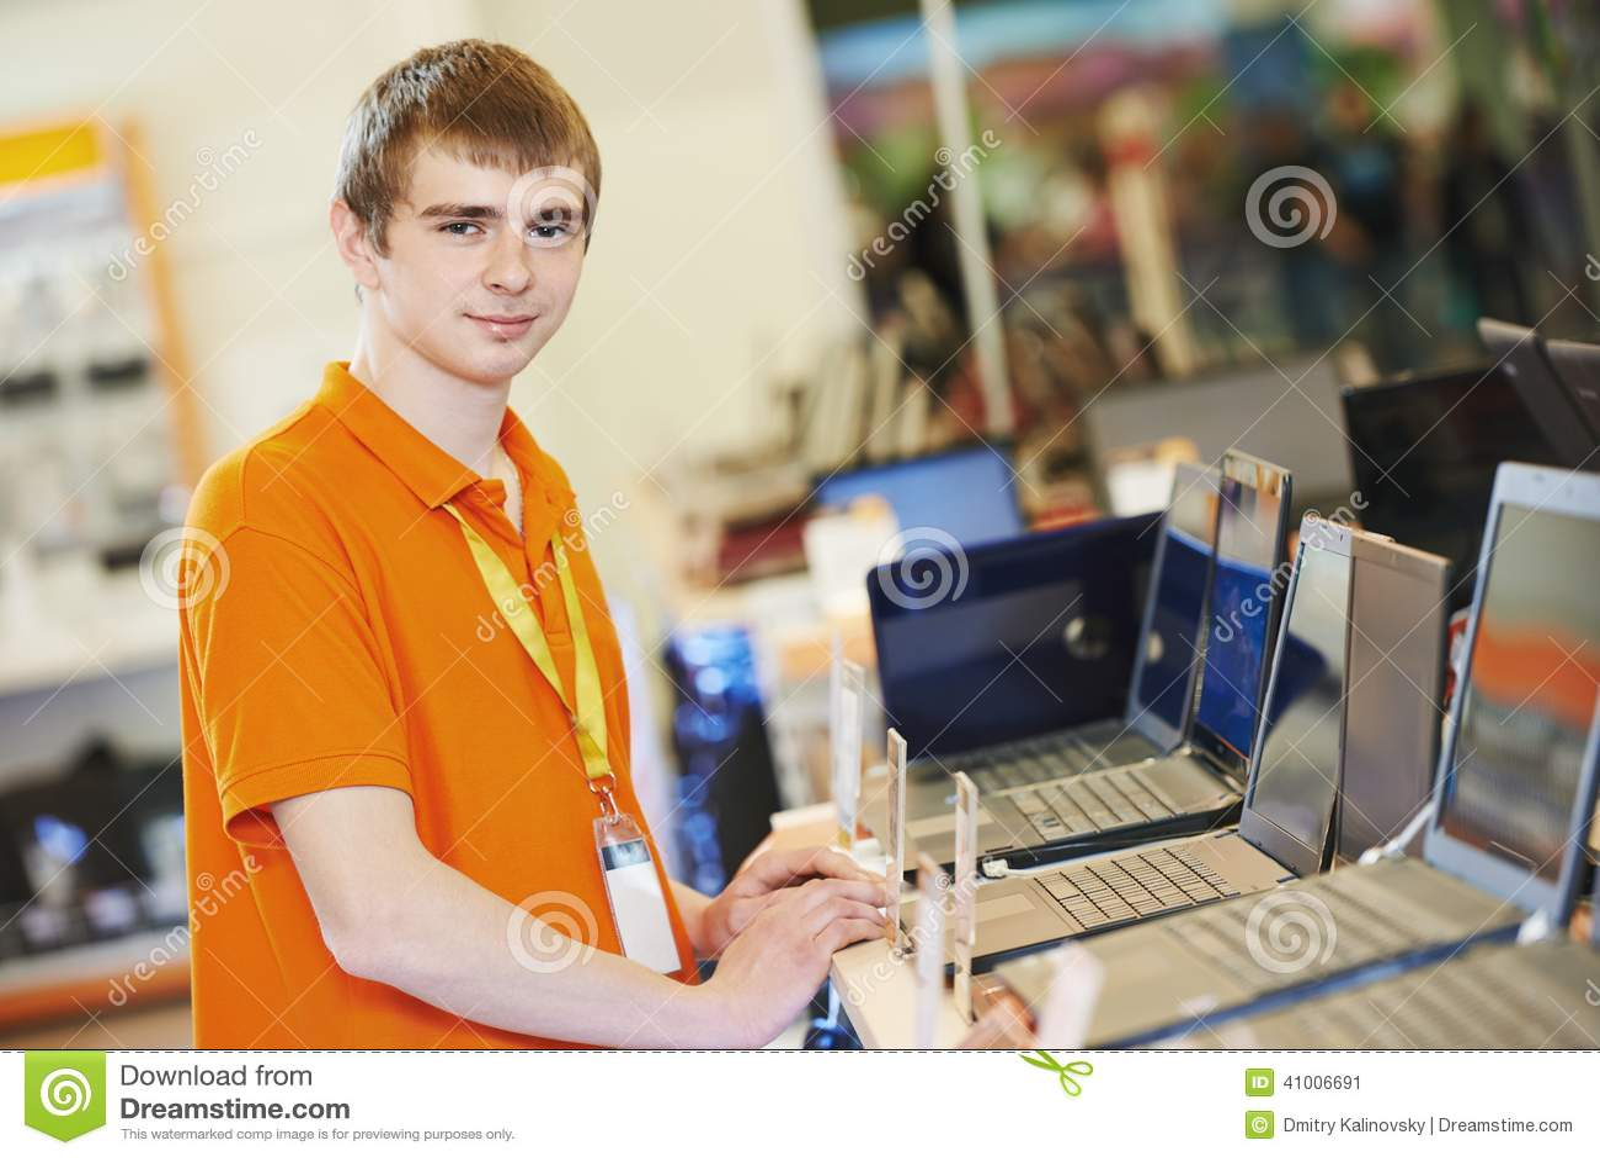 Трахнул менеджера магазина, Менеджер магазина лихо порет узкоглазую тайку на столе 27 фотография